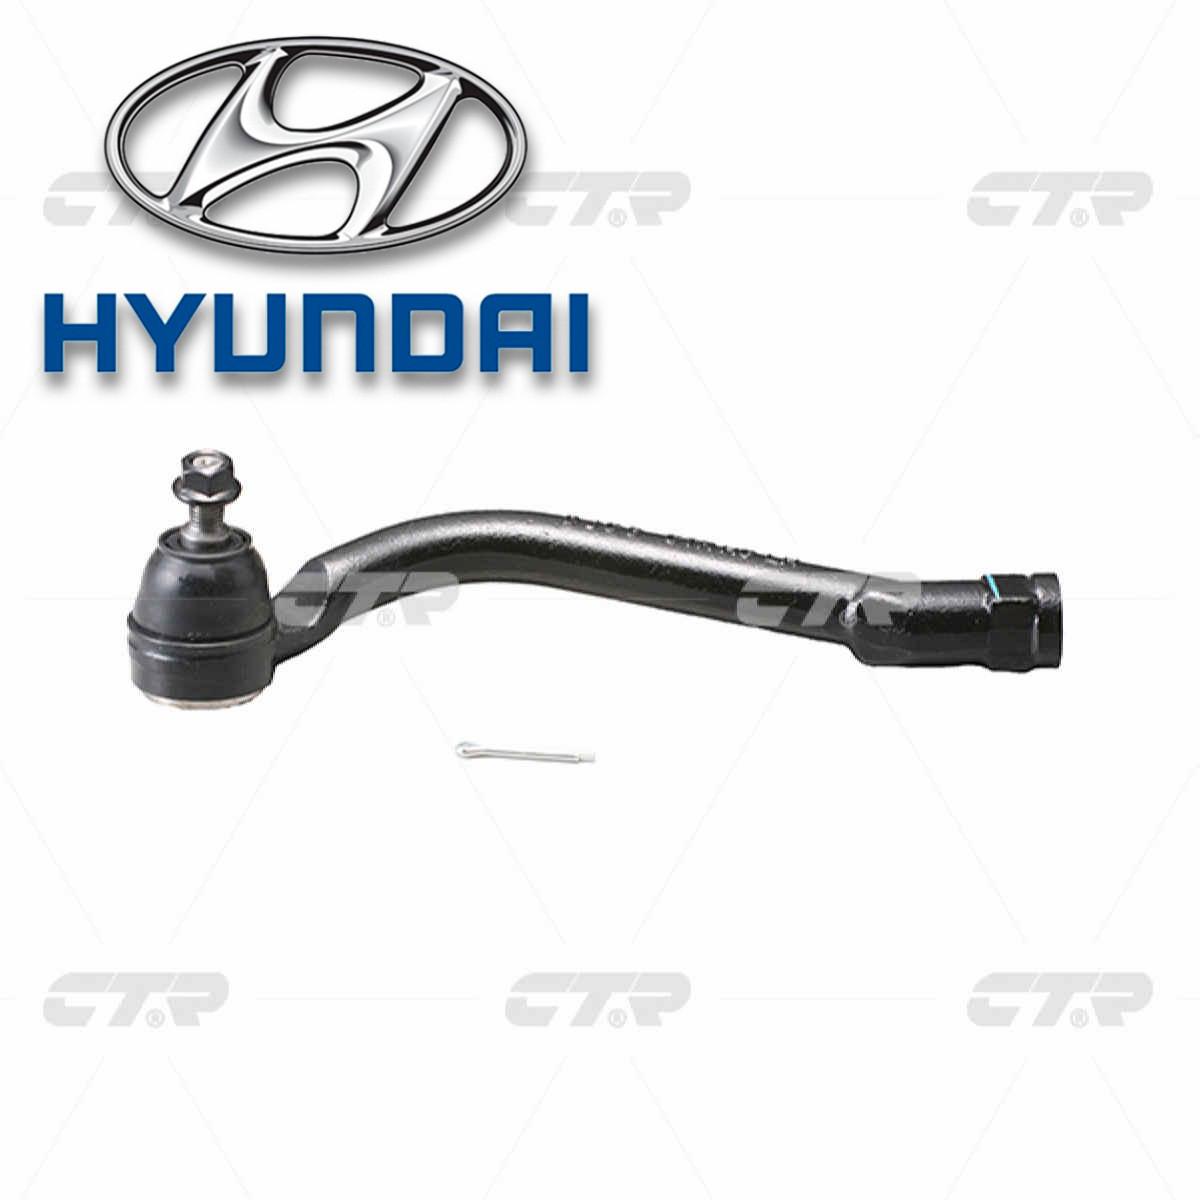 Наконечник рулевой тяги на Grandeur HYUNDAI CTR Корея CEKH-45L